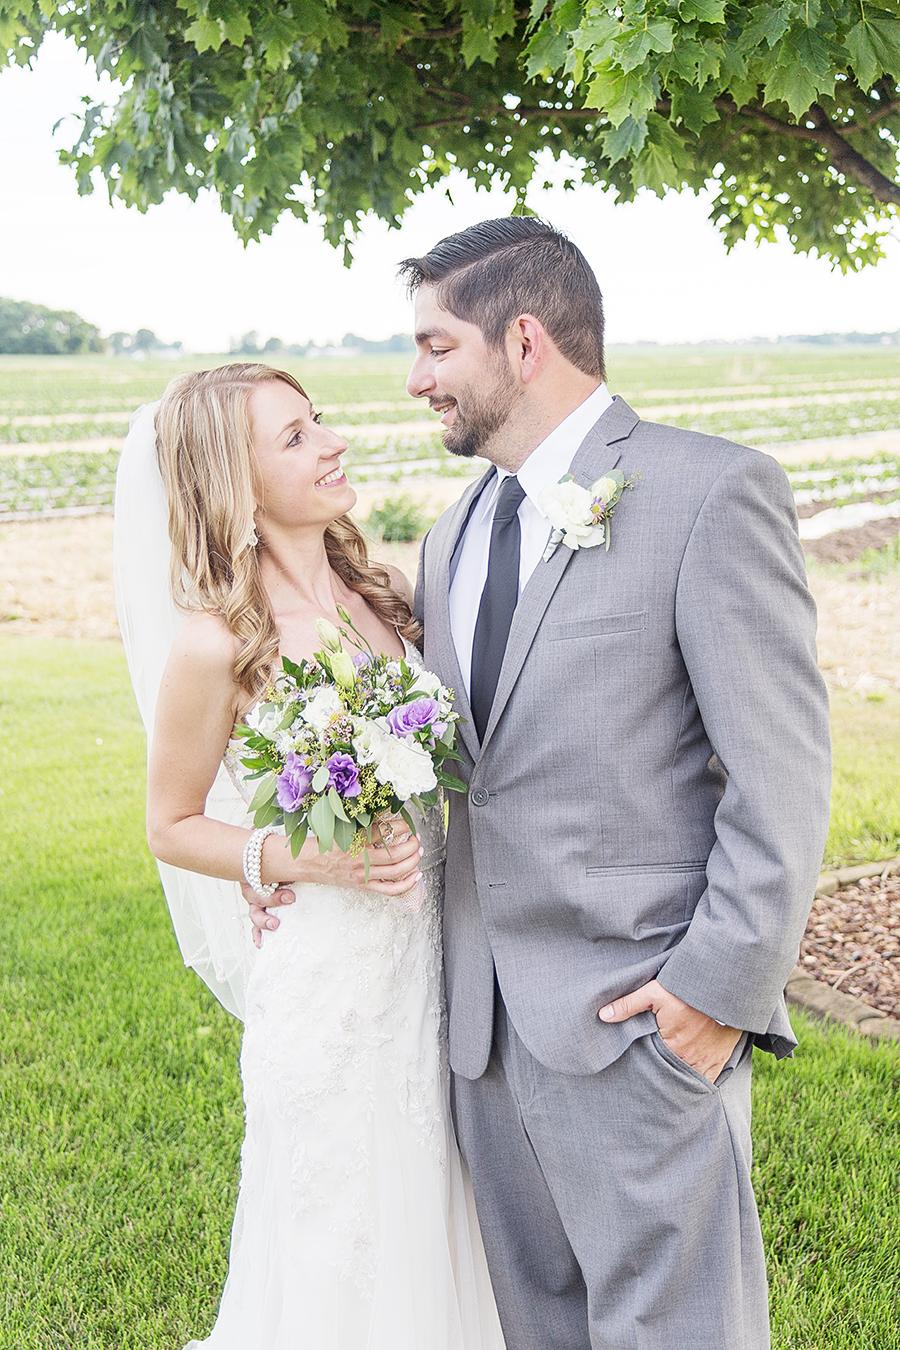 Naperville-wedding-photographer-3-13.jpg